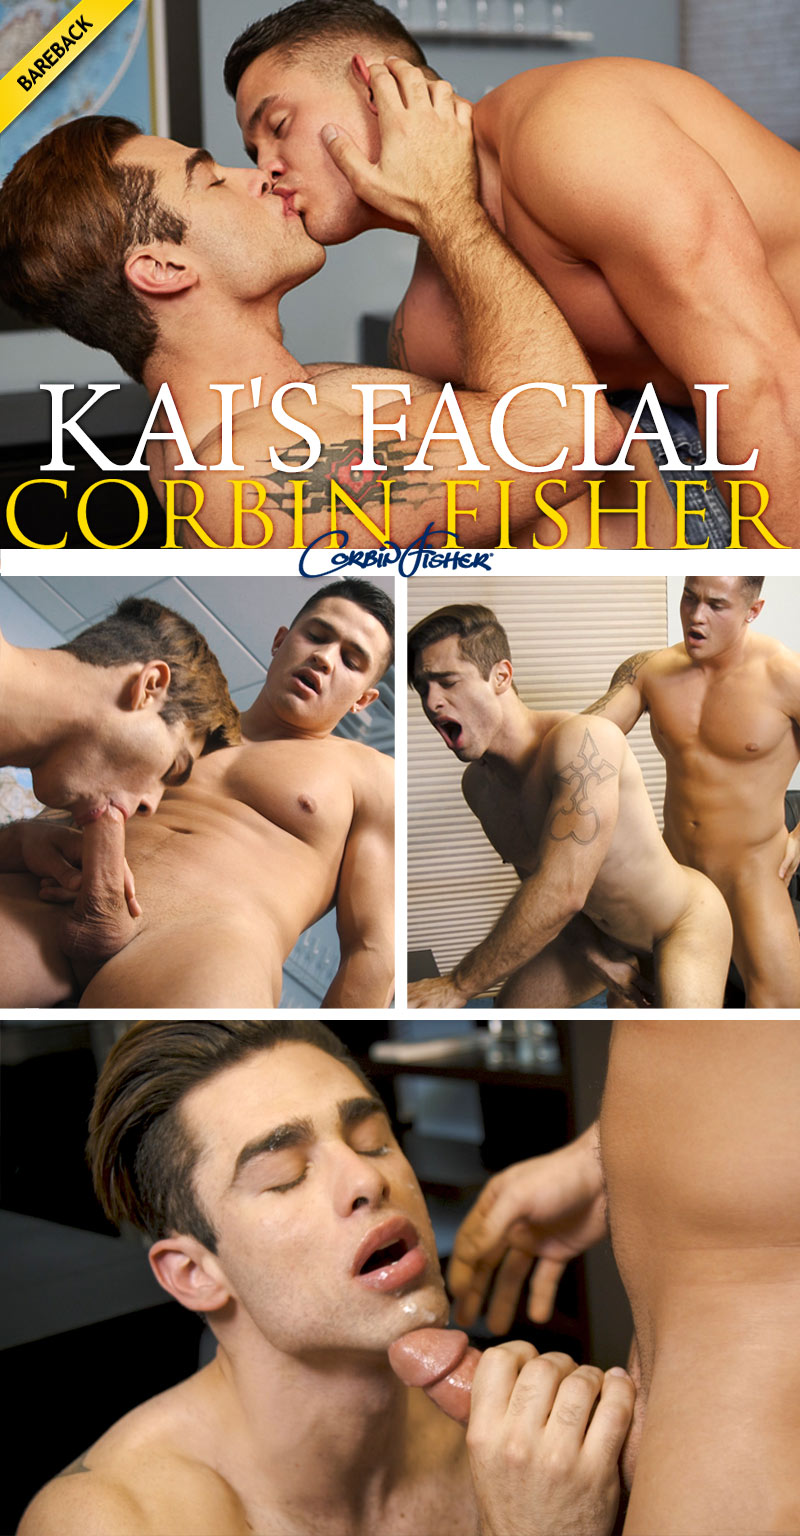 Kai's Facial (Colt Fucks Kai) at CorbinFisher